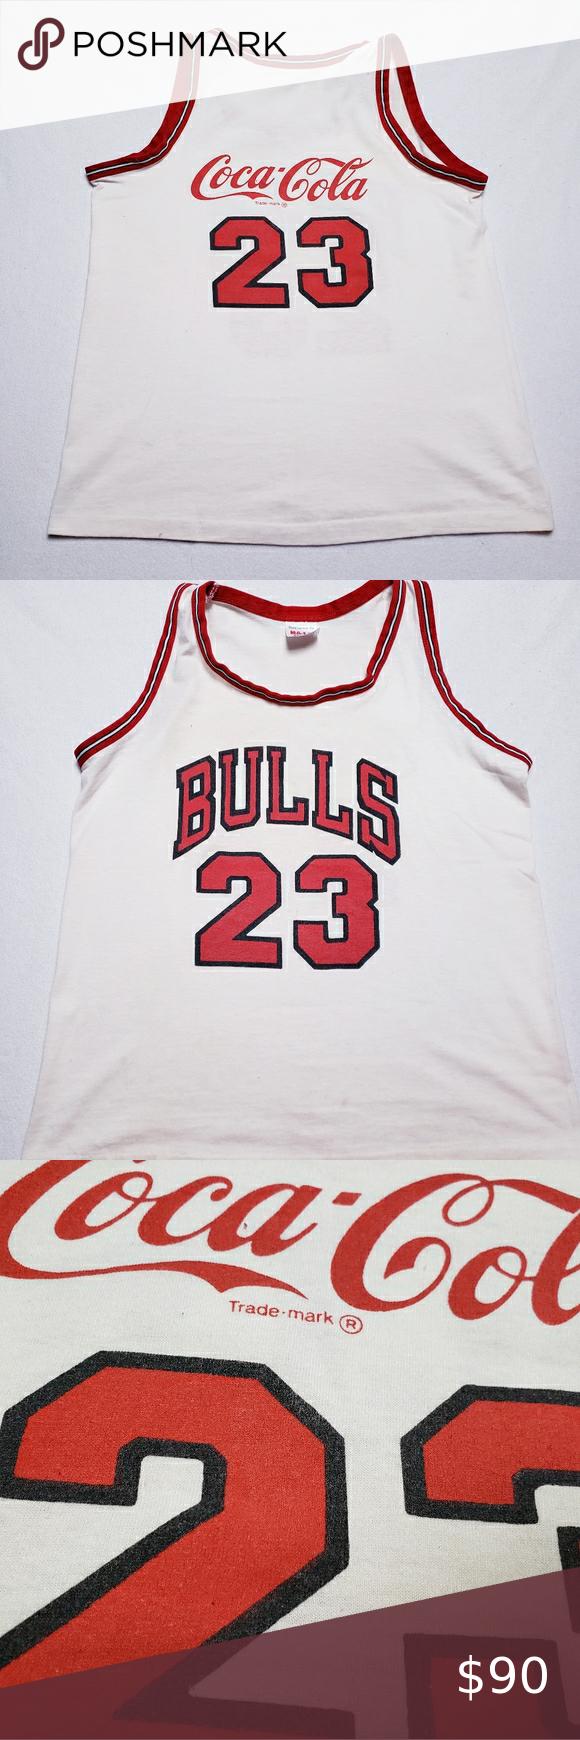 Jordan X Coke Collab Jersey Chicago Bulls Promo Shirts Vintage Shirts Tank Top Shirt